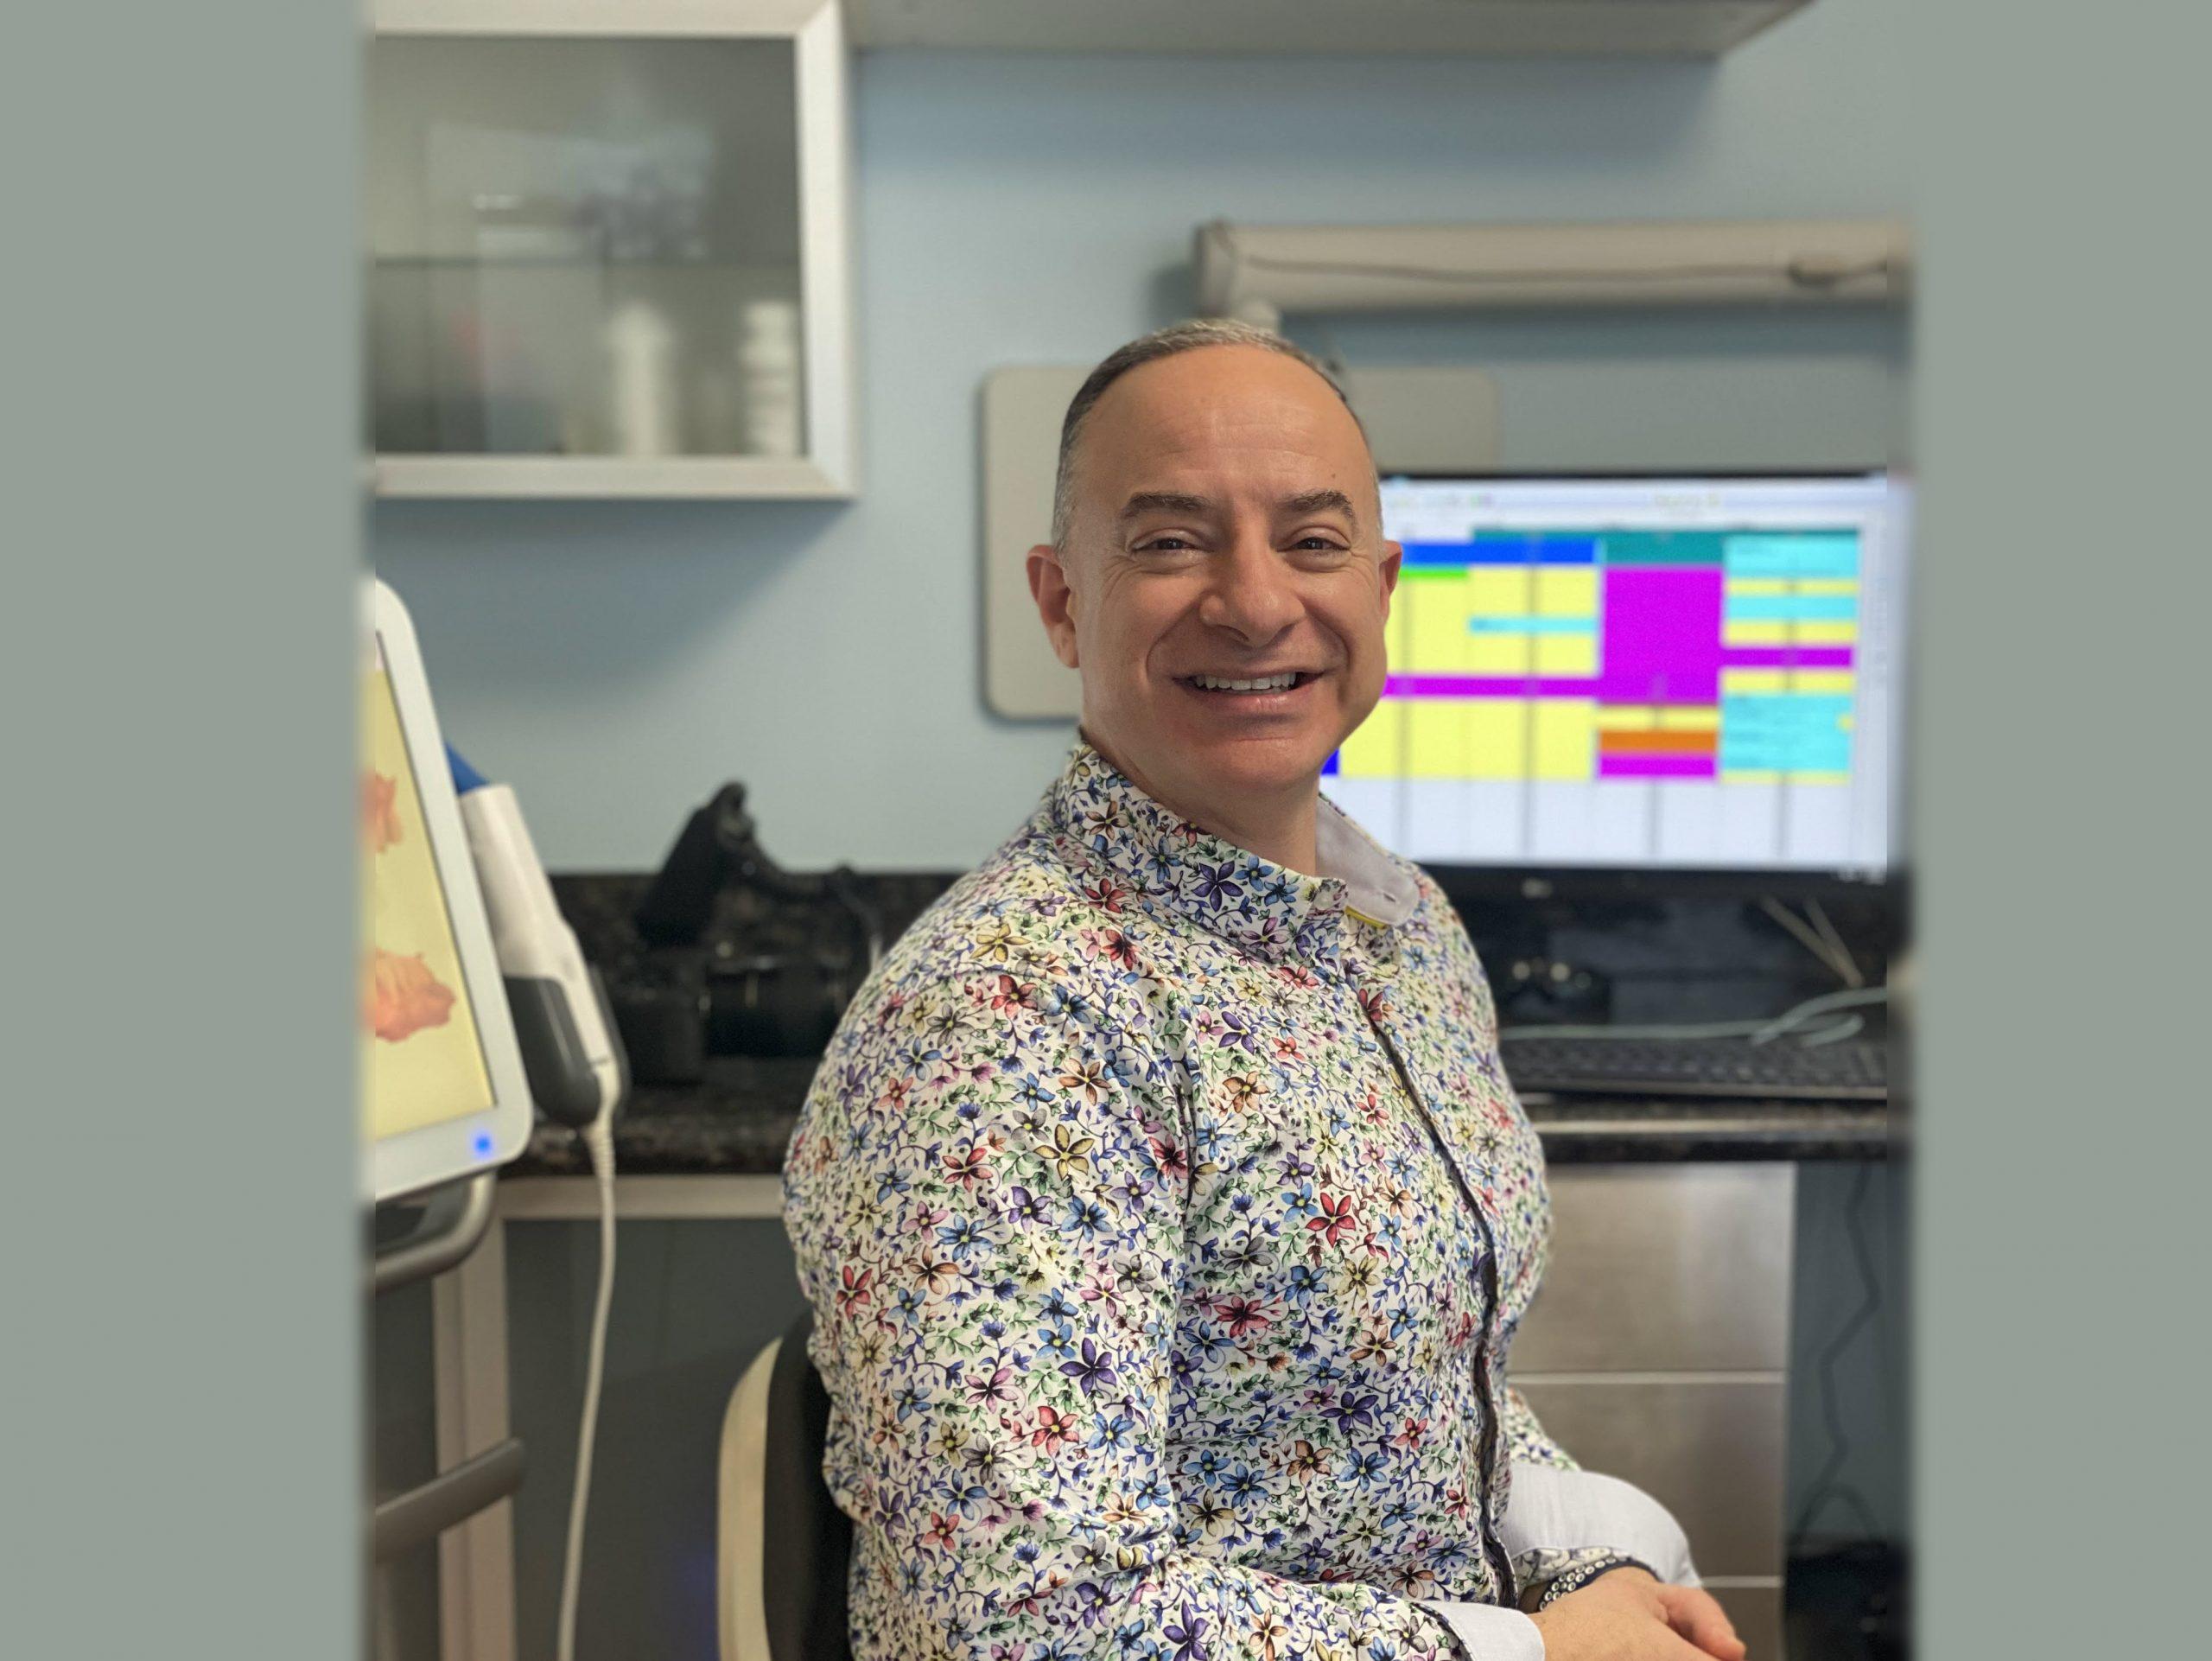 Charles Kamel - Dentist